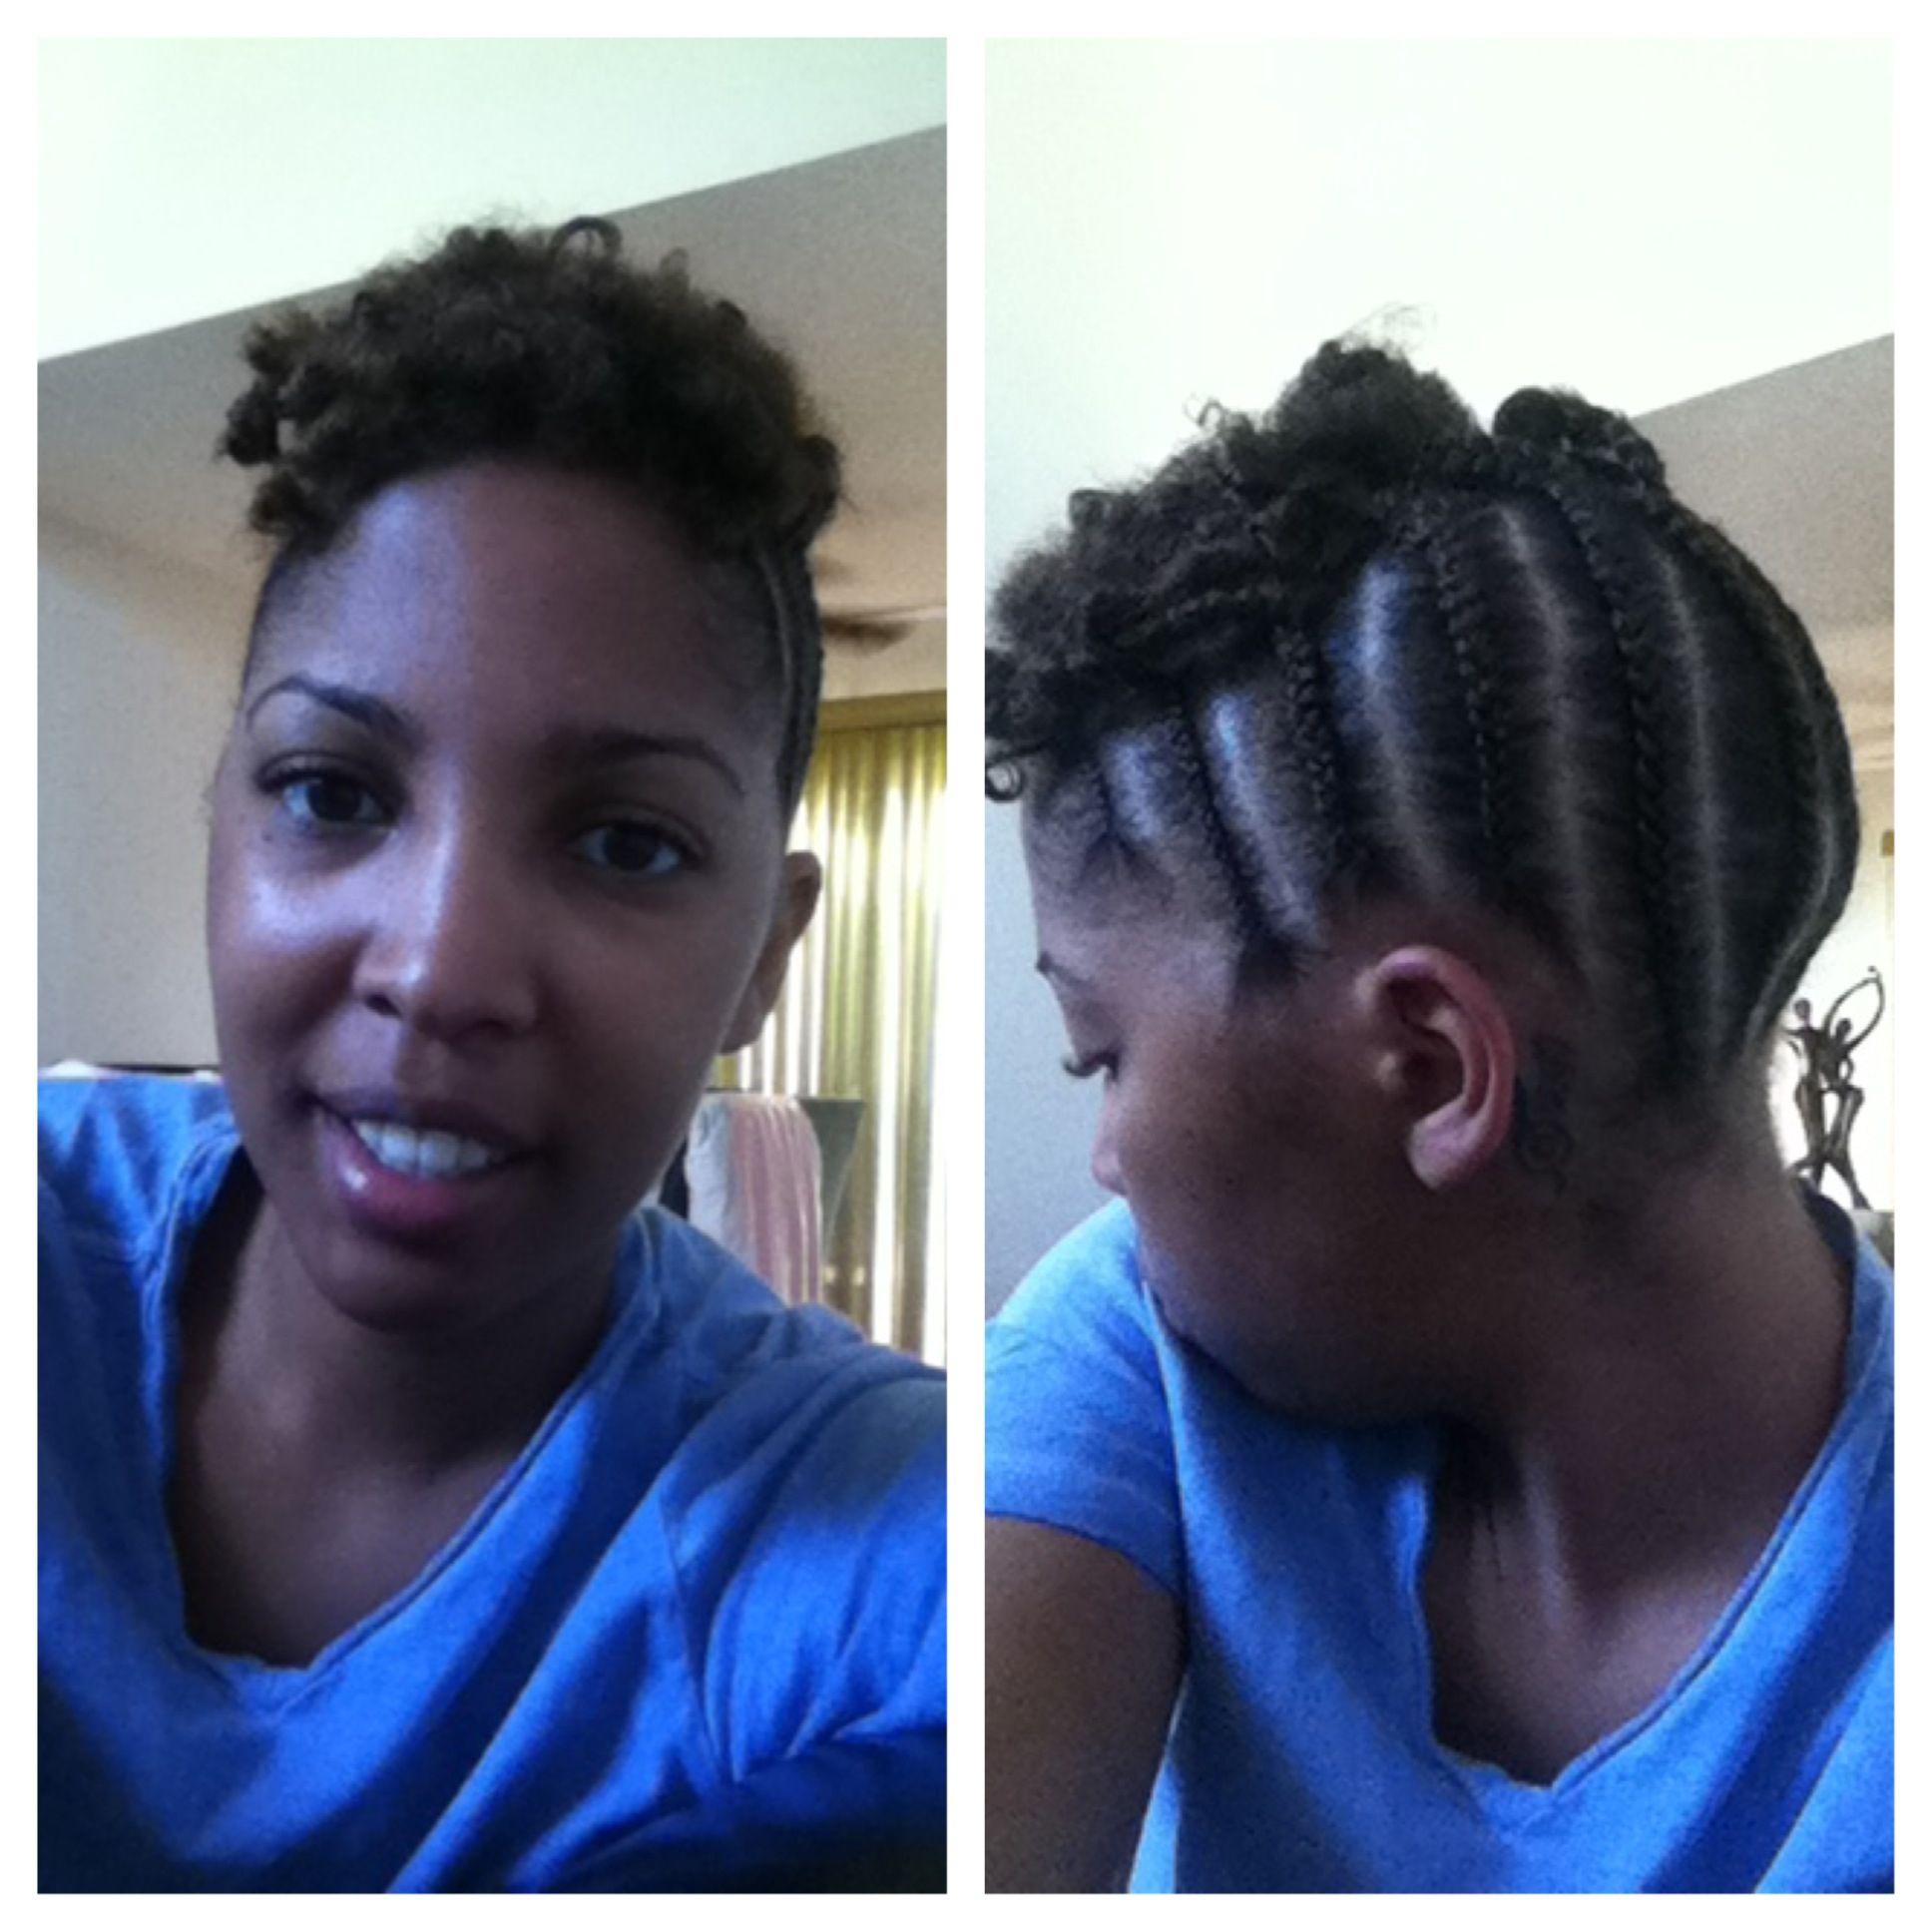 Naturalhair braids braidstyles updo hair ideas pinterest updo